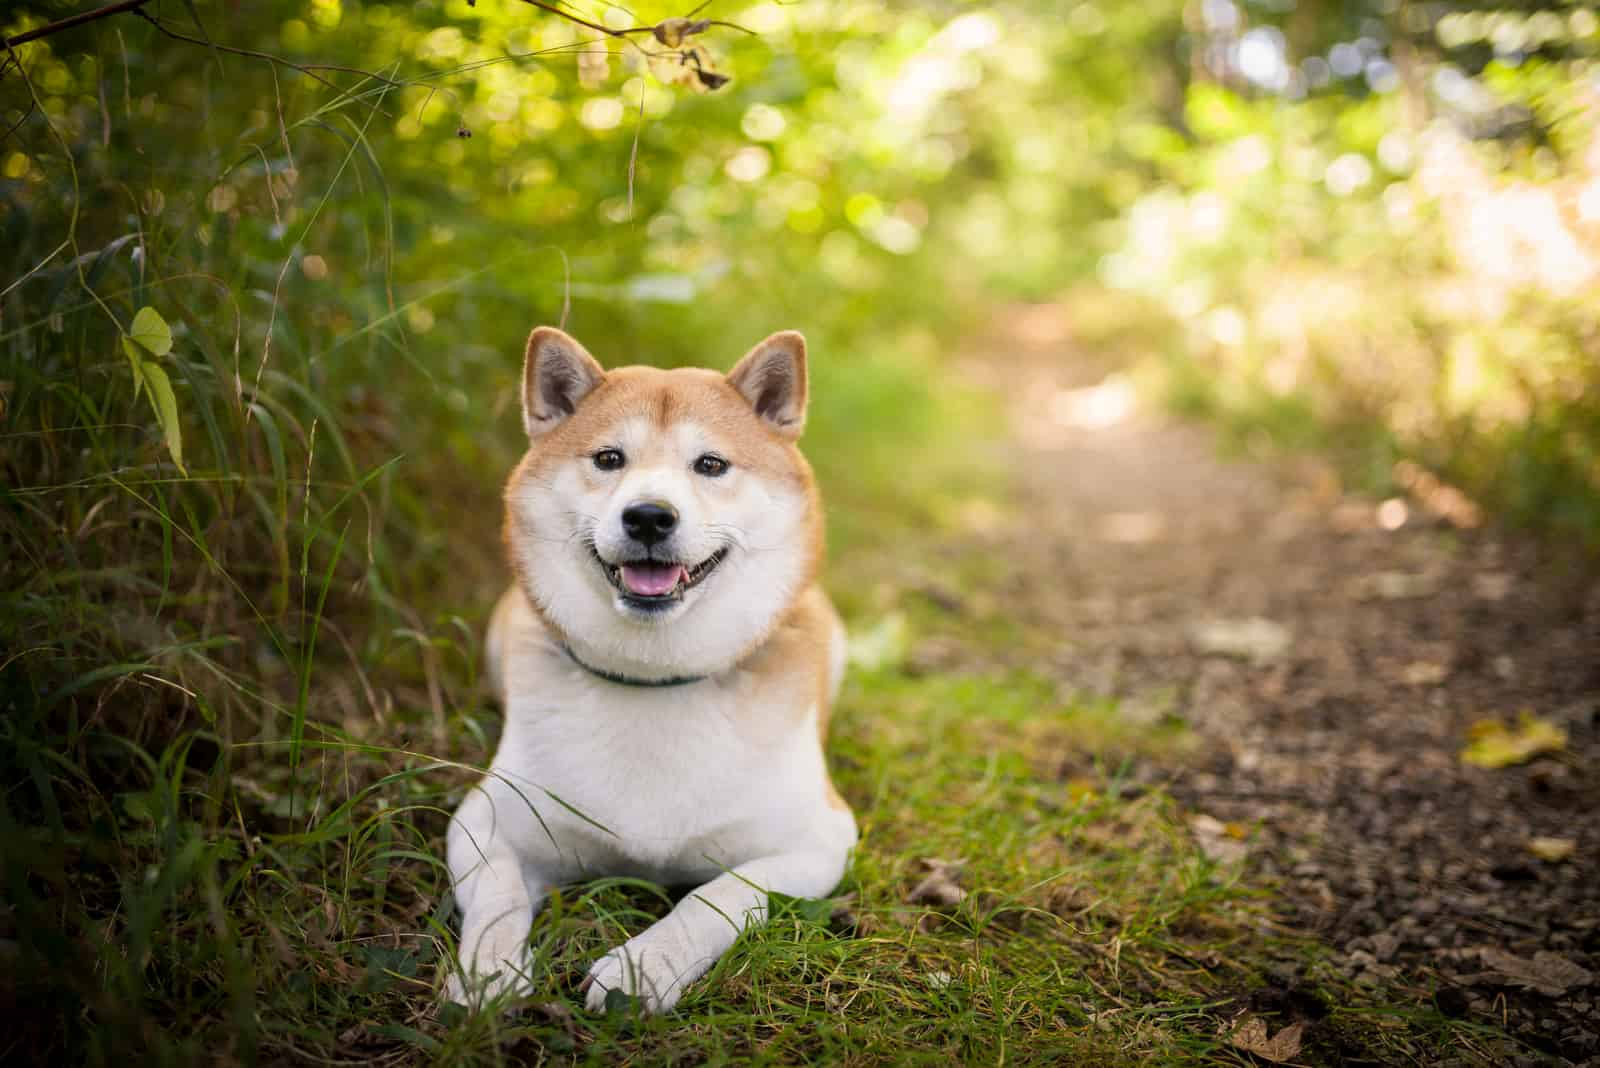 Shiba inu dog lying in the nature